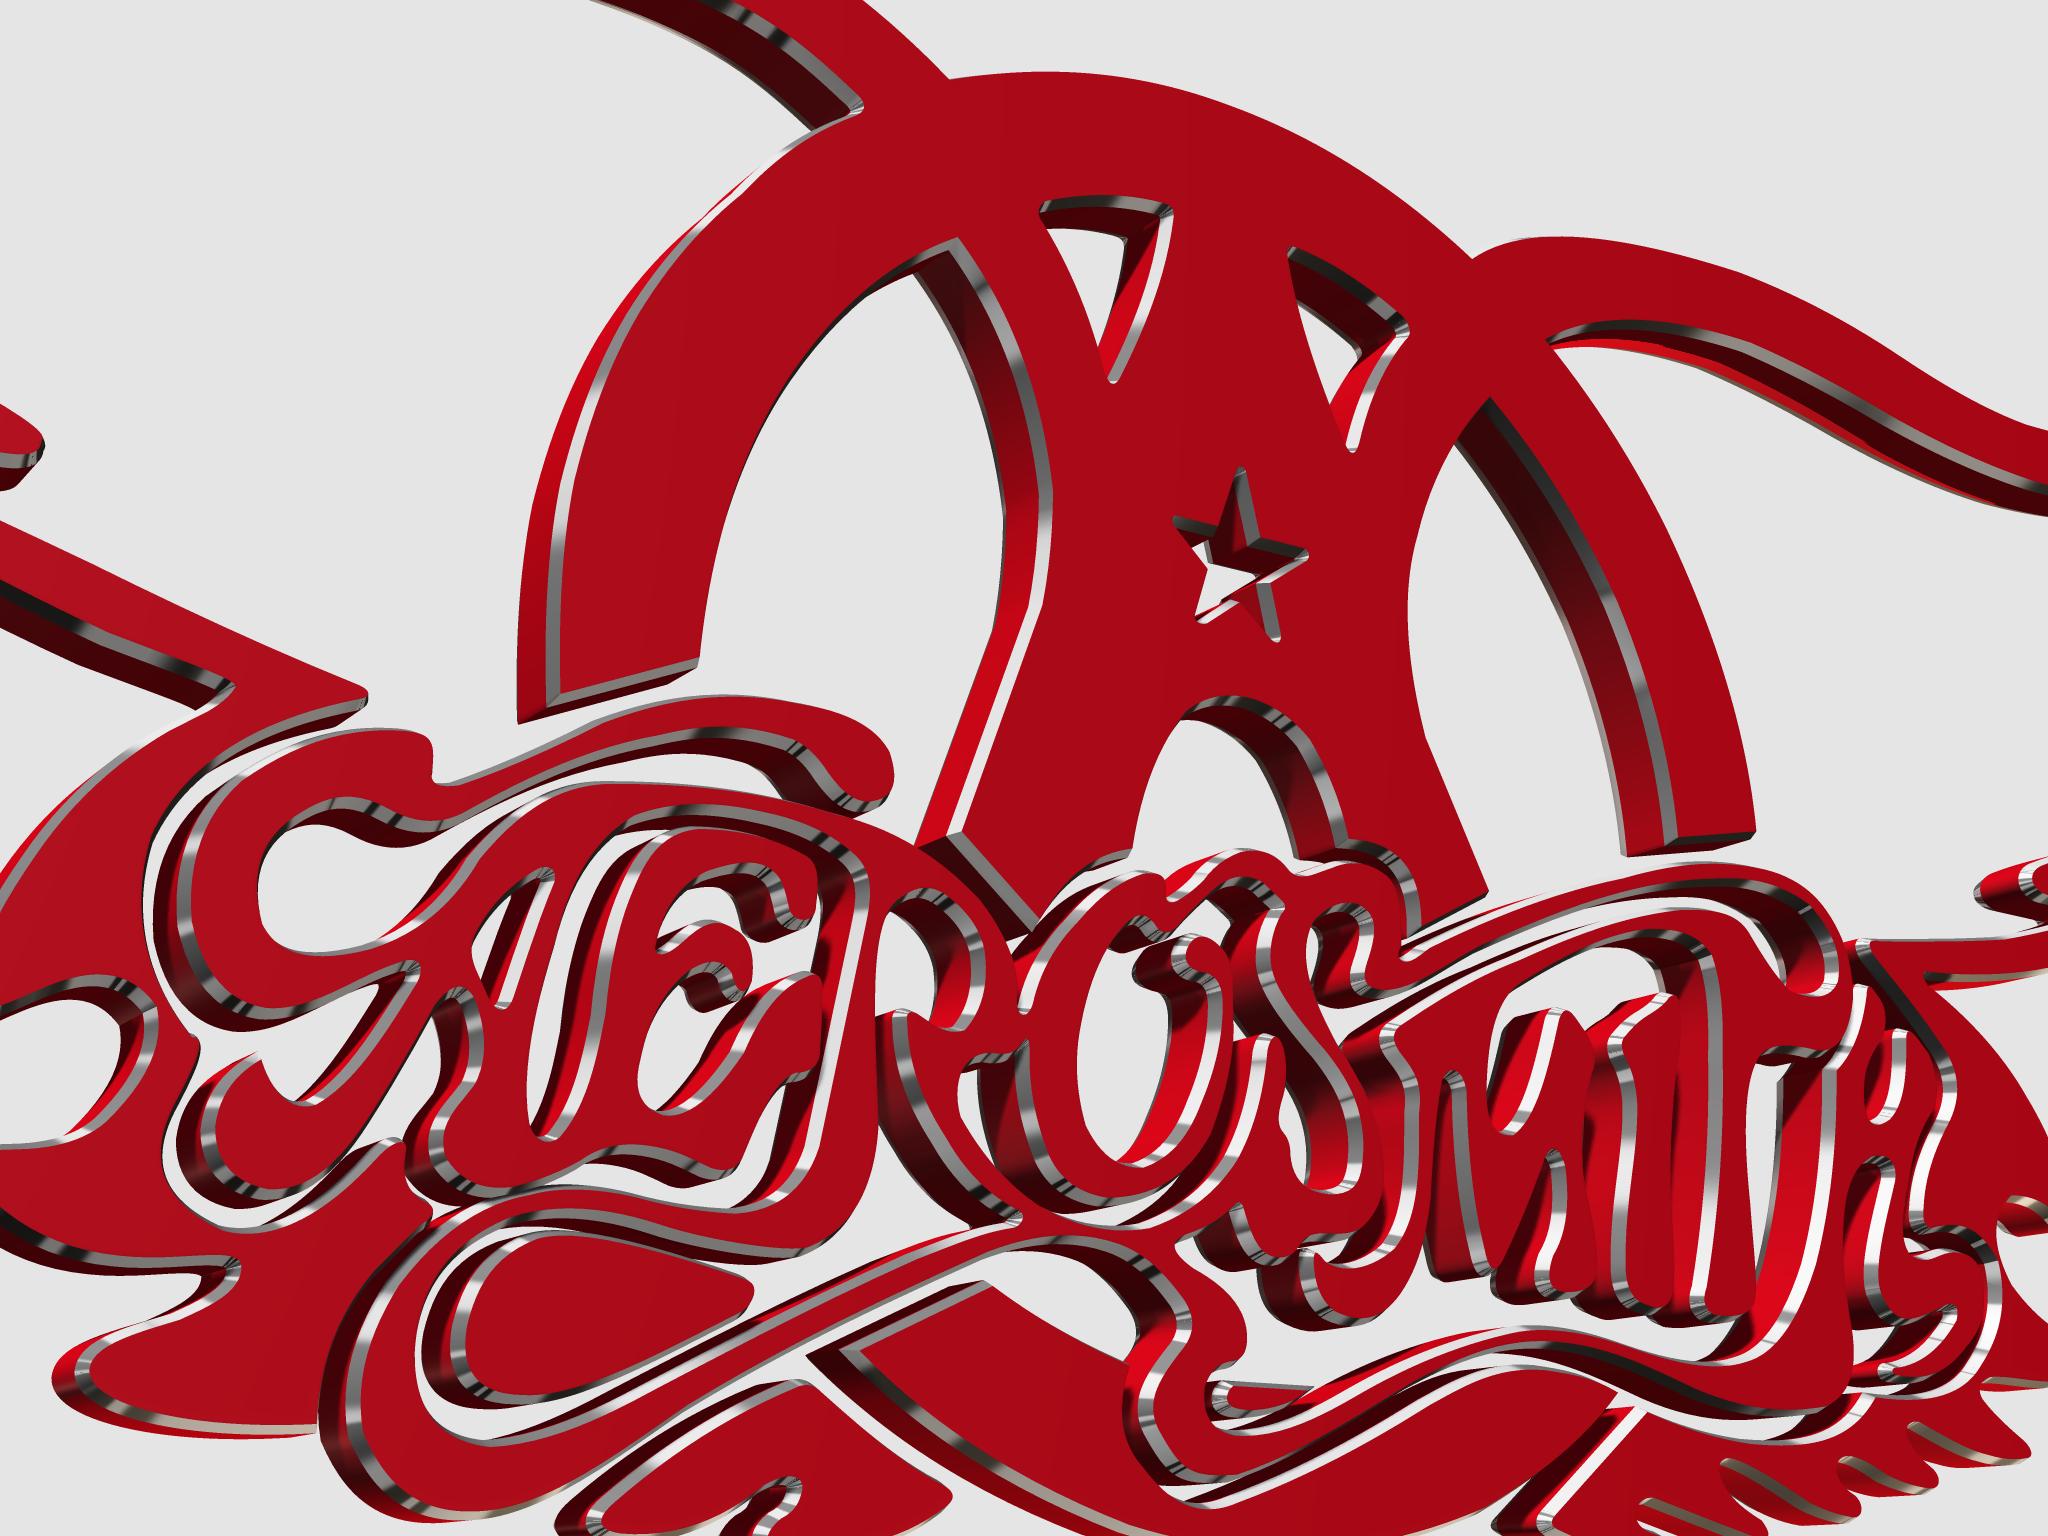 Aerosmith Logo By Cozmicone On Deviantart